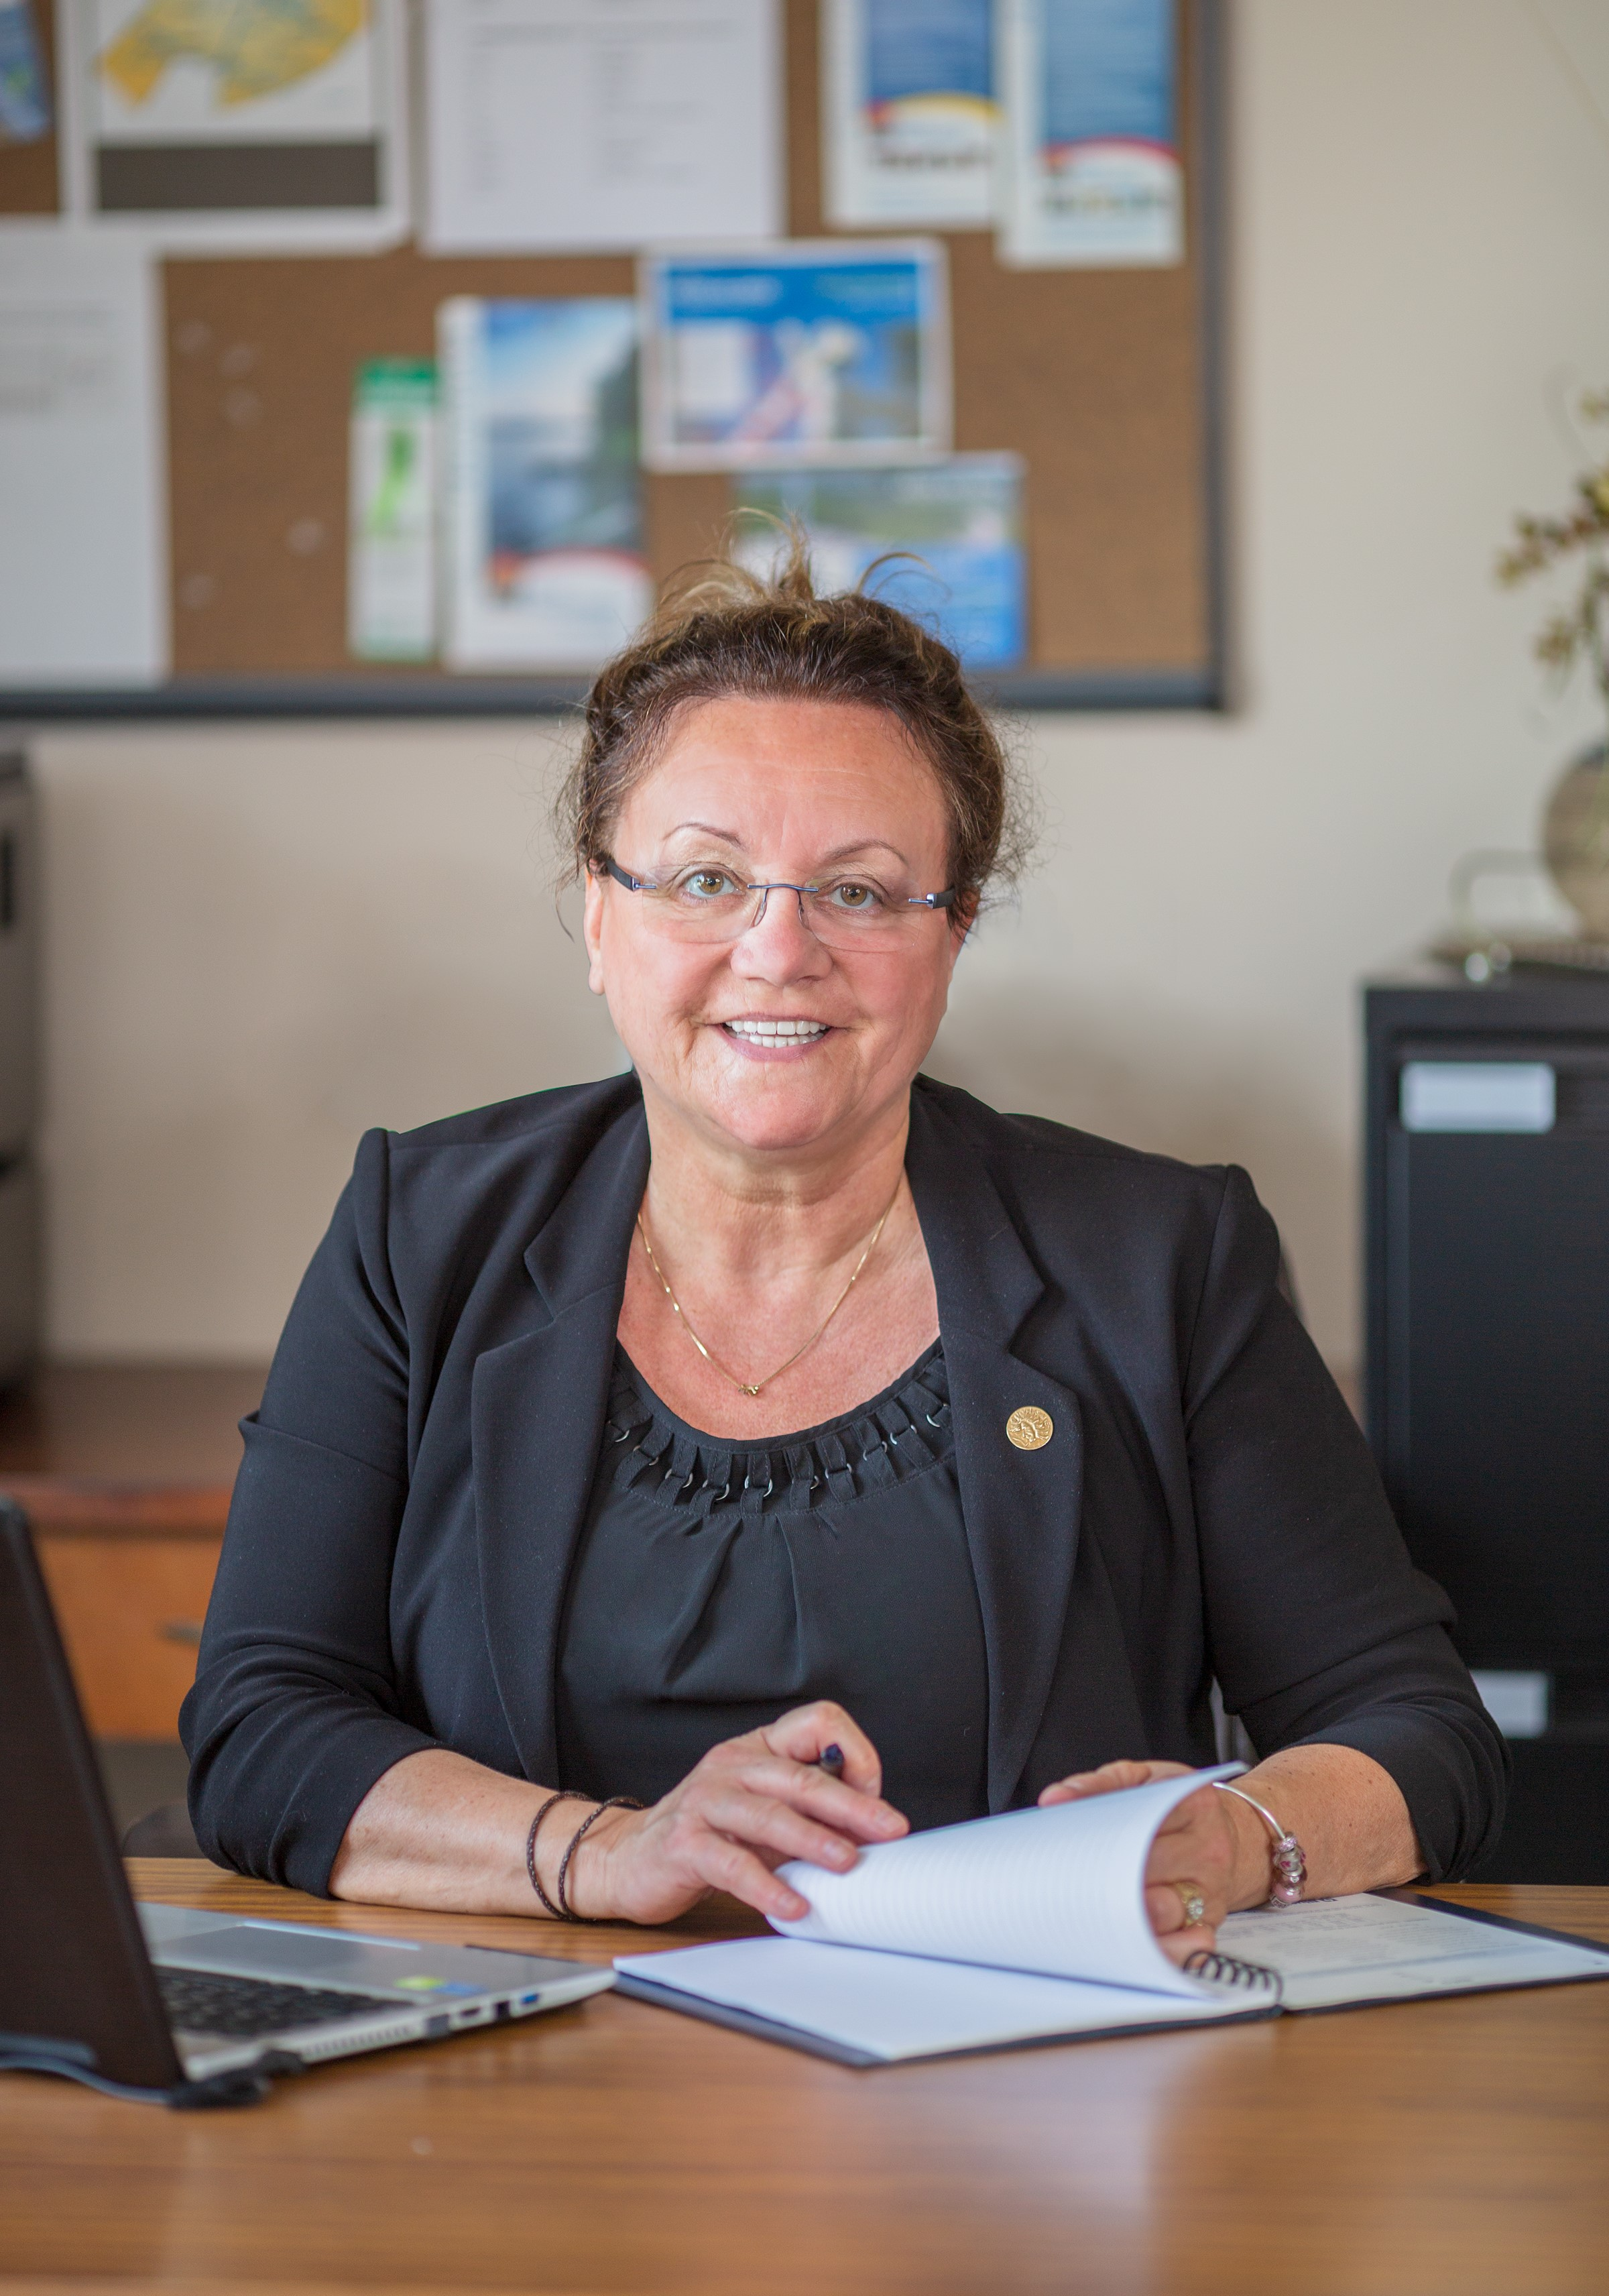 Guylaine Sirois prefet elue au suffrage universel MRC de Temiscouata